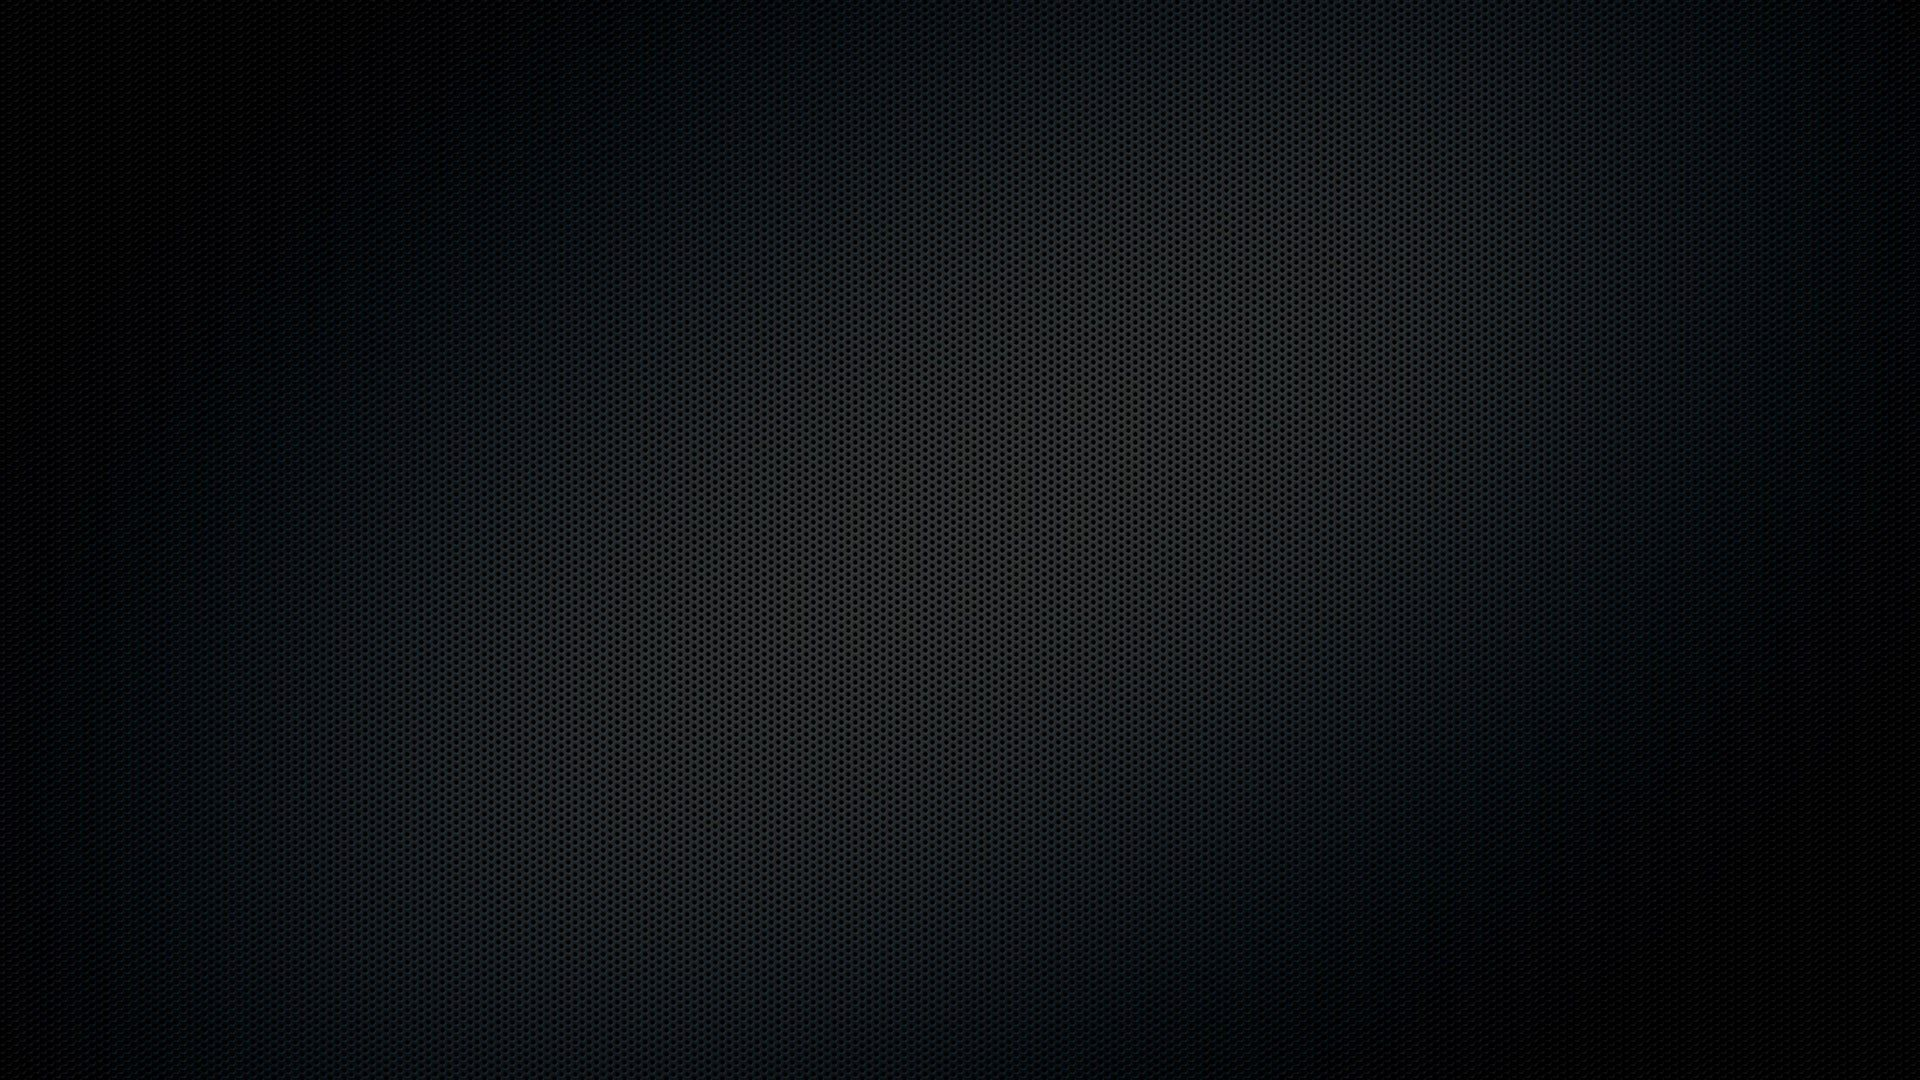 Black Wallpapers 1920x1080 - Wallpaper Cave